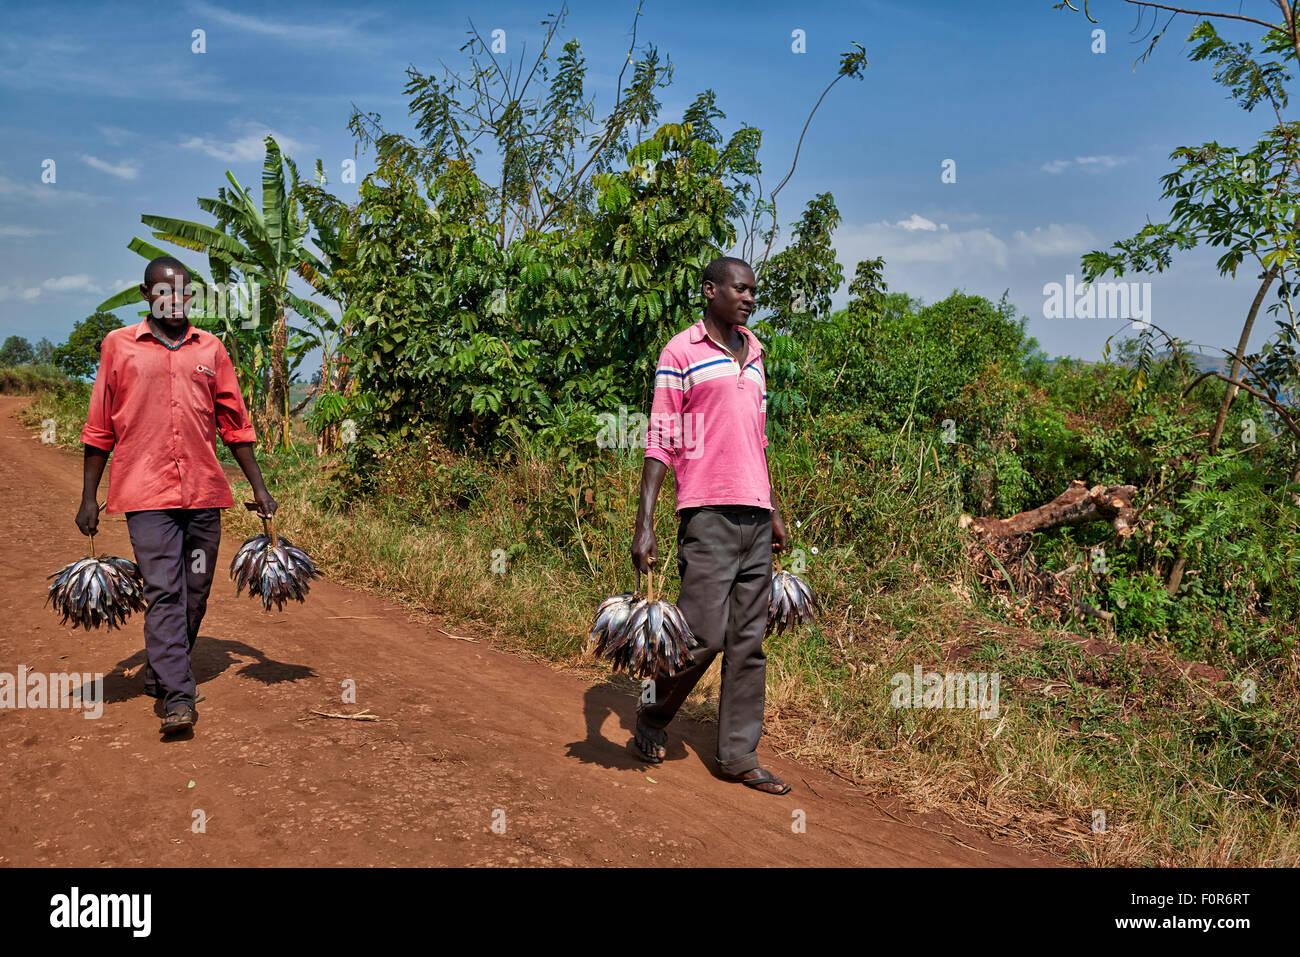 fishermen bringing their catch home, Bunyaruguru Crater Lakes region, Uganda, Africa - Stock Image